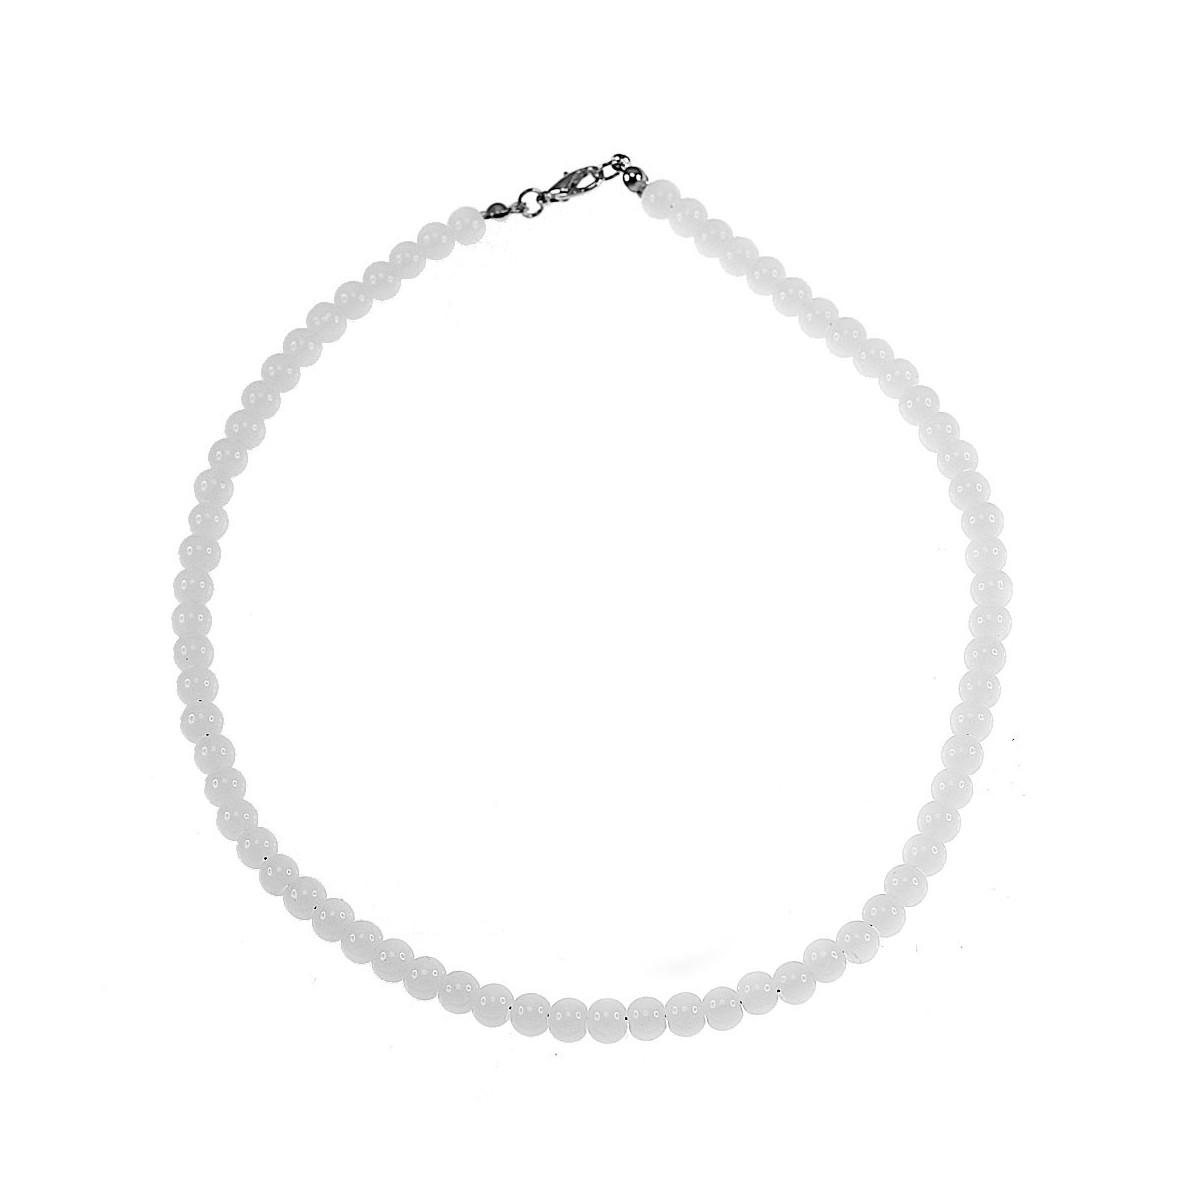 Collier perles de verre blanc